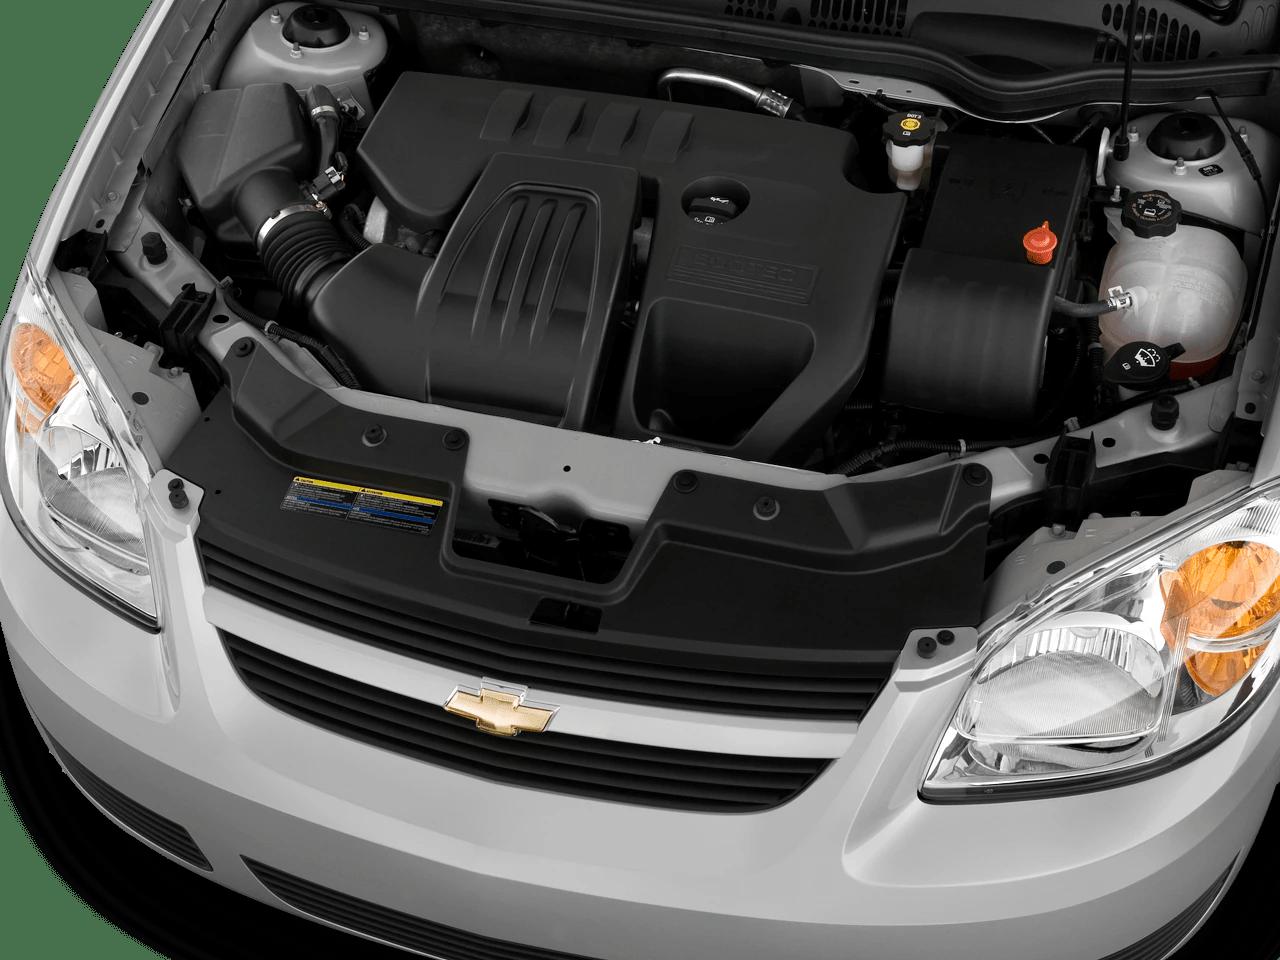 hight resolution of 2010 chevy cobalt 2 2 engine diagram